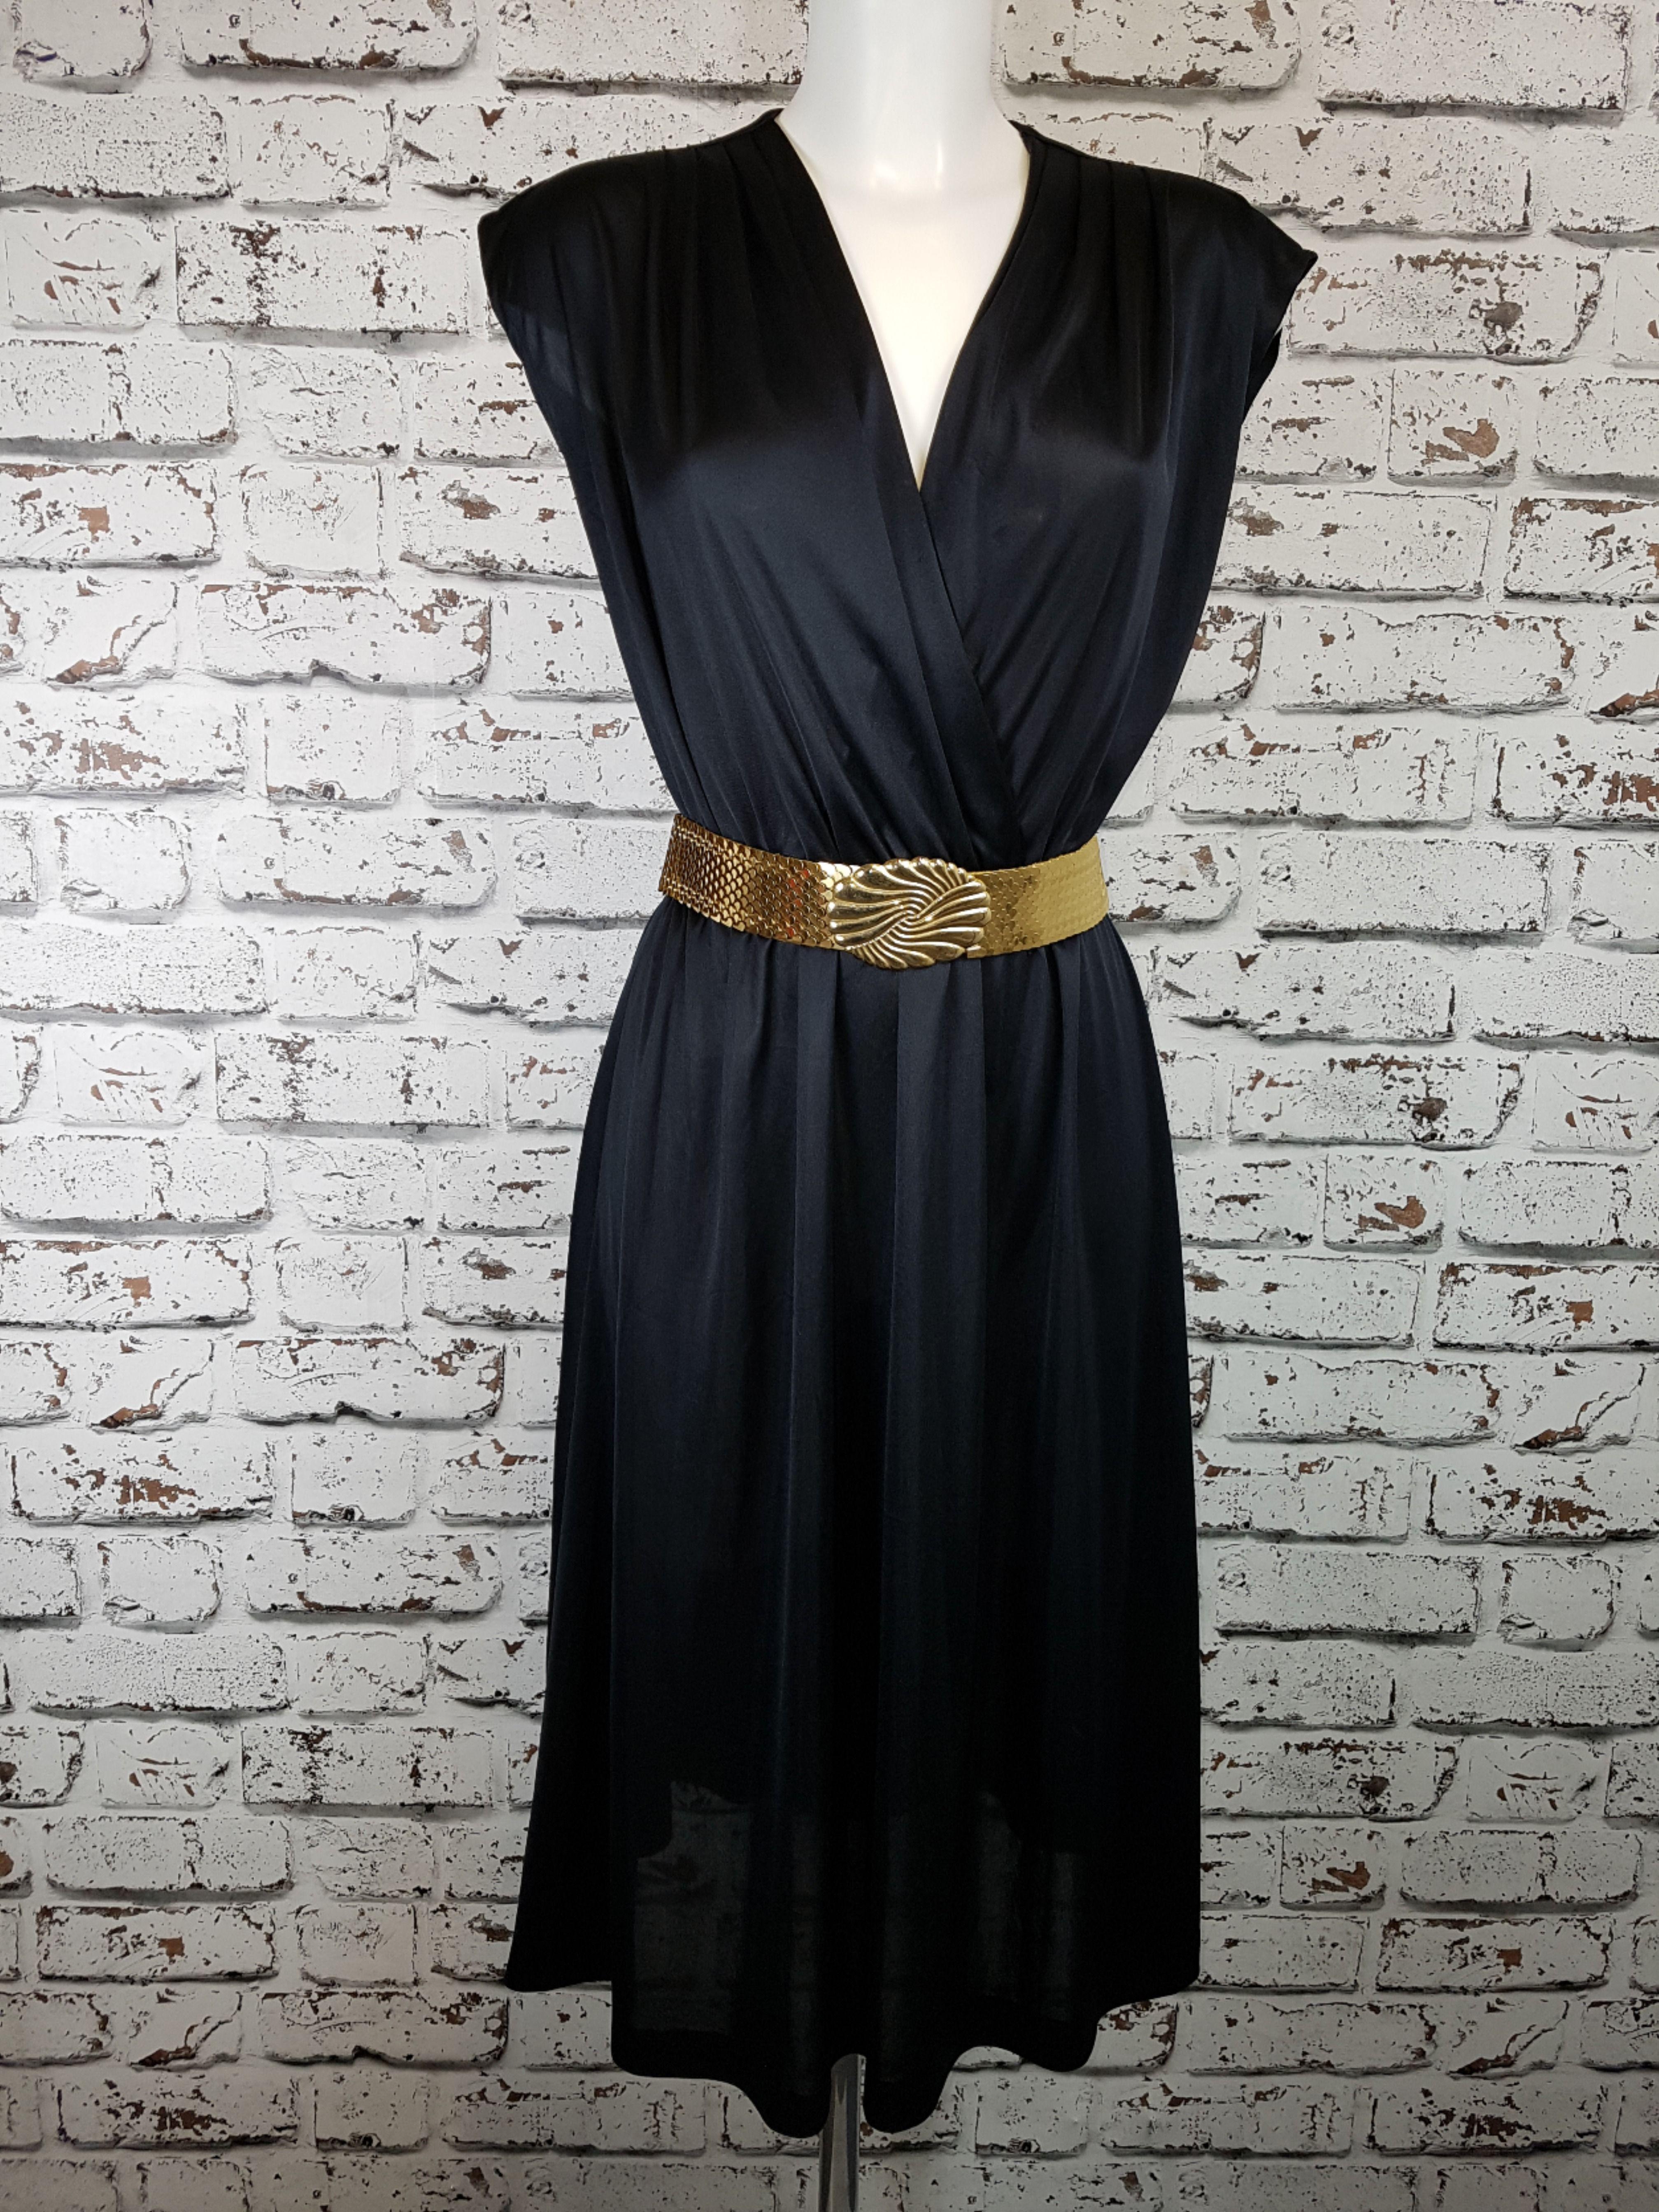 70s Classic Dress Disco Style Classic Dress Dresses Vintage Dresses [ 5376 x 4031 Pixel ]